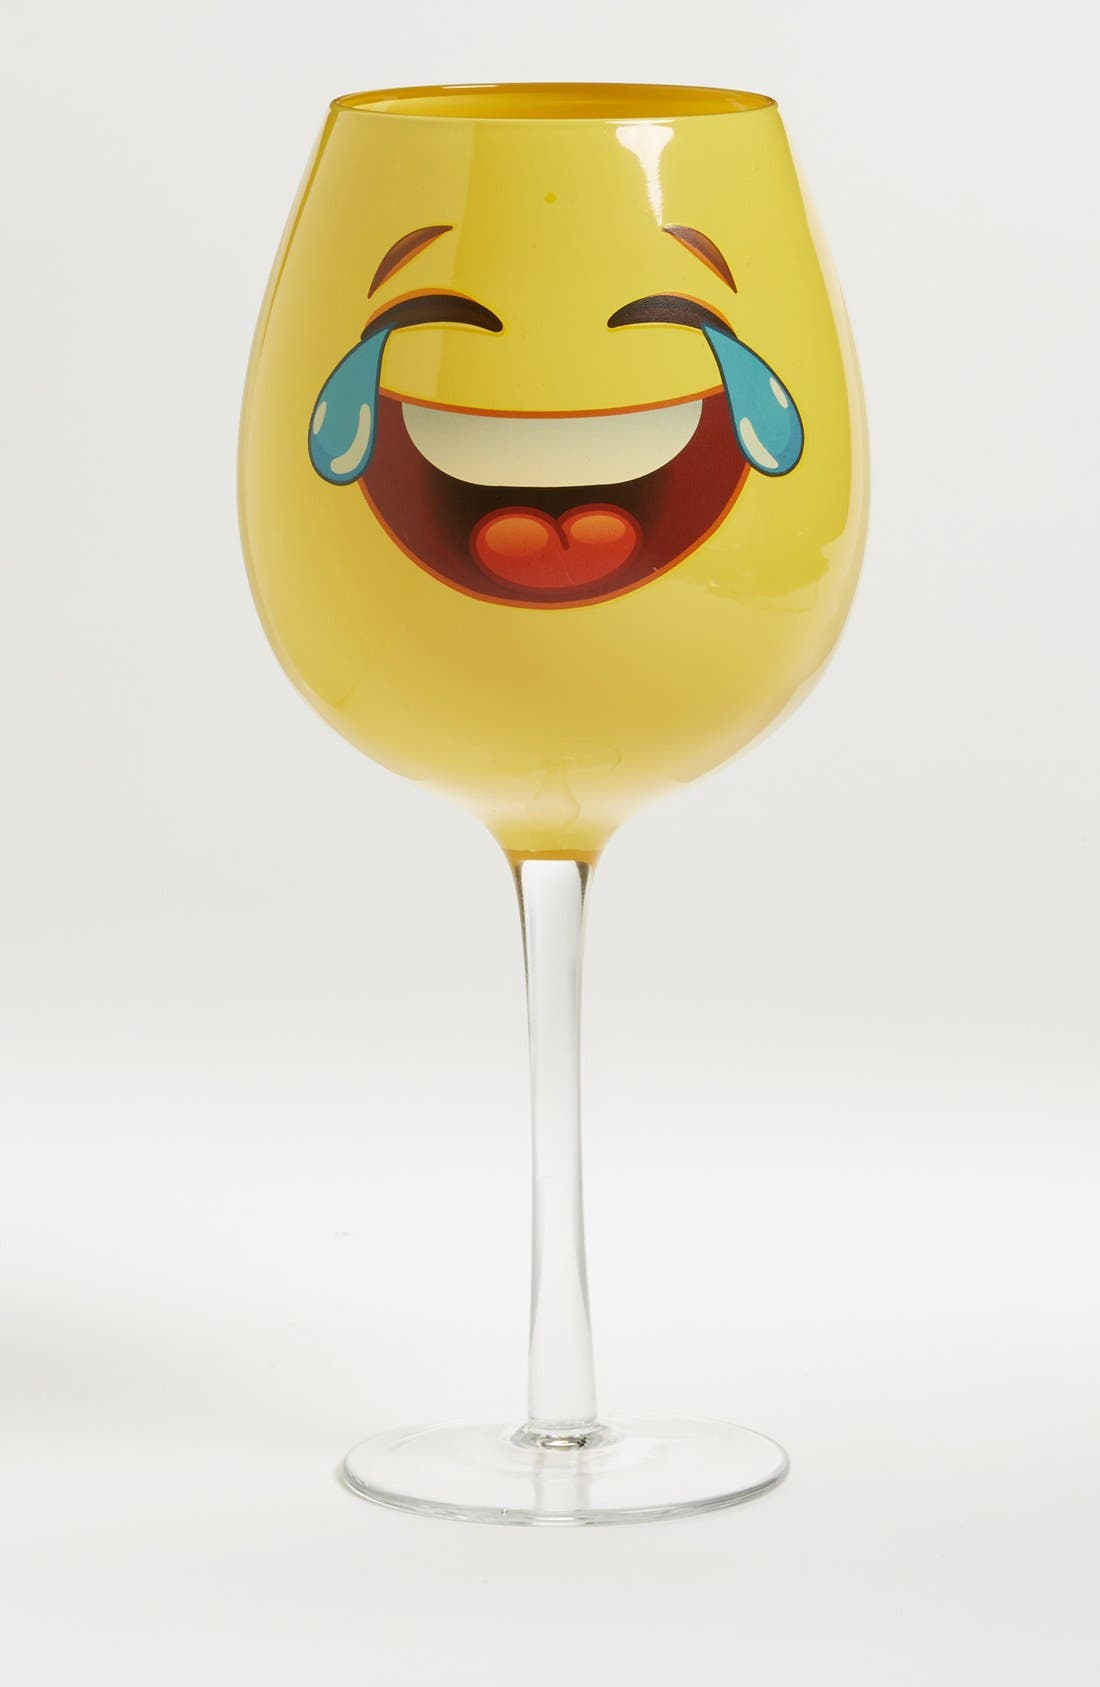 Alternate Image 1 Selected - DCI 'Emoji' Oversized Wine Glass